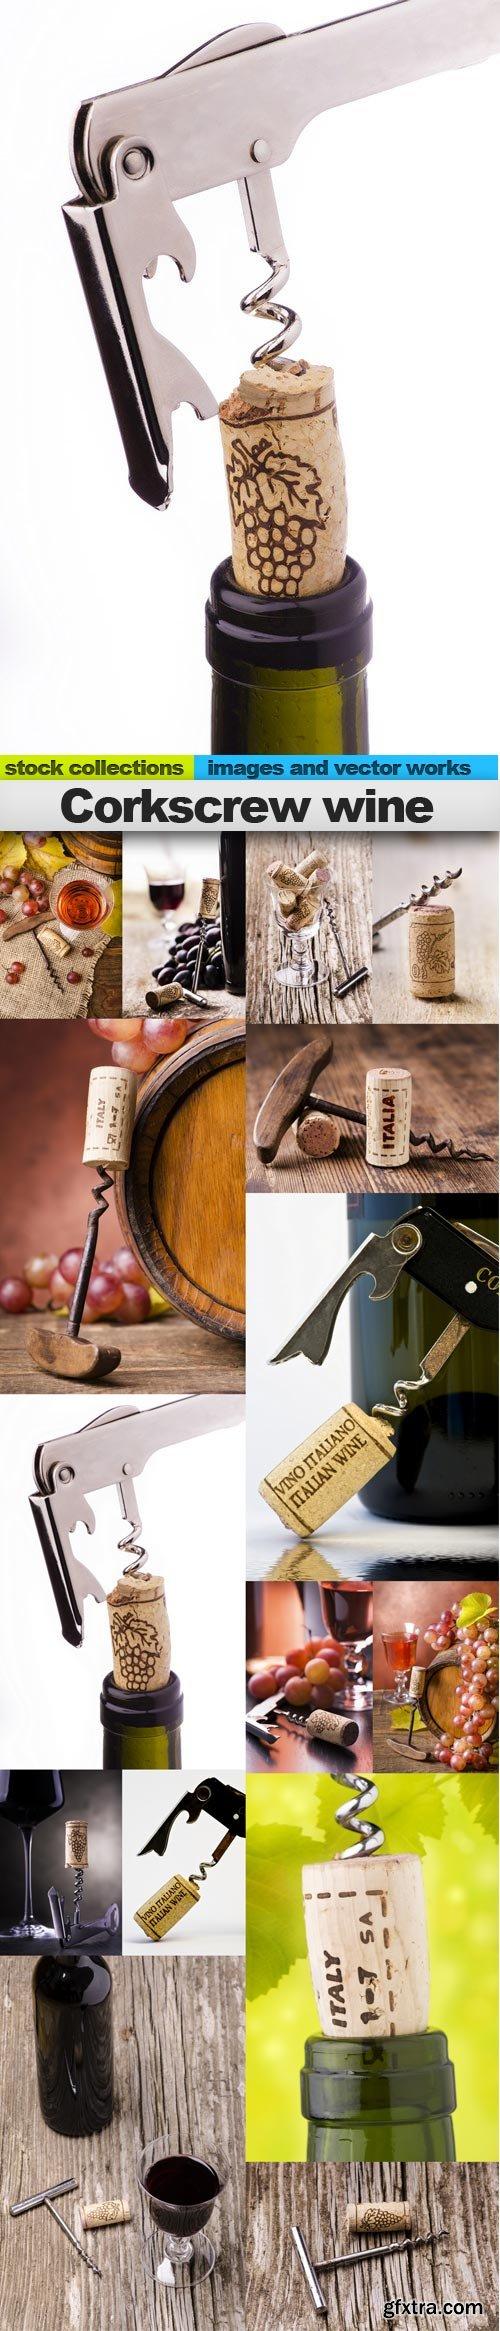 Corkscrew wine, 15 x UHQ JPEG